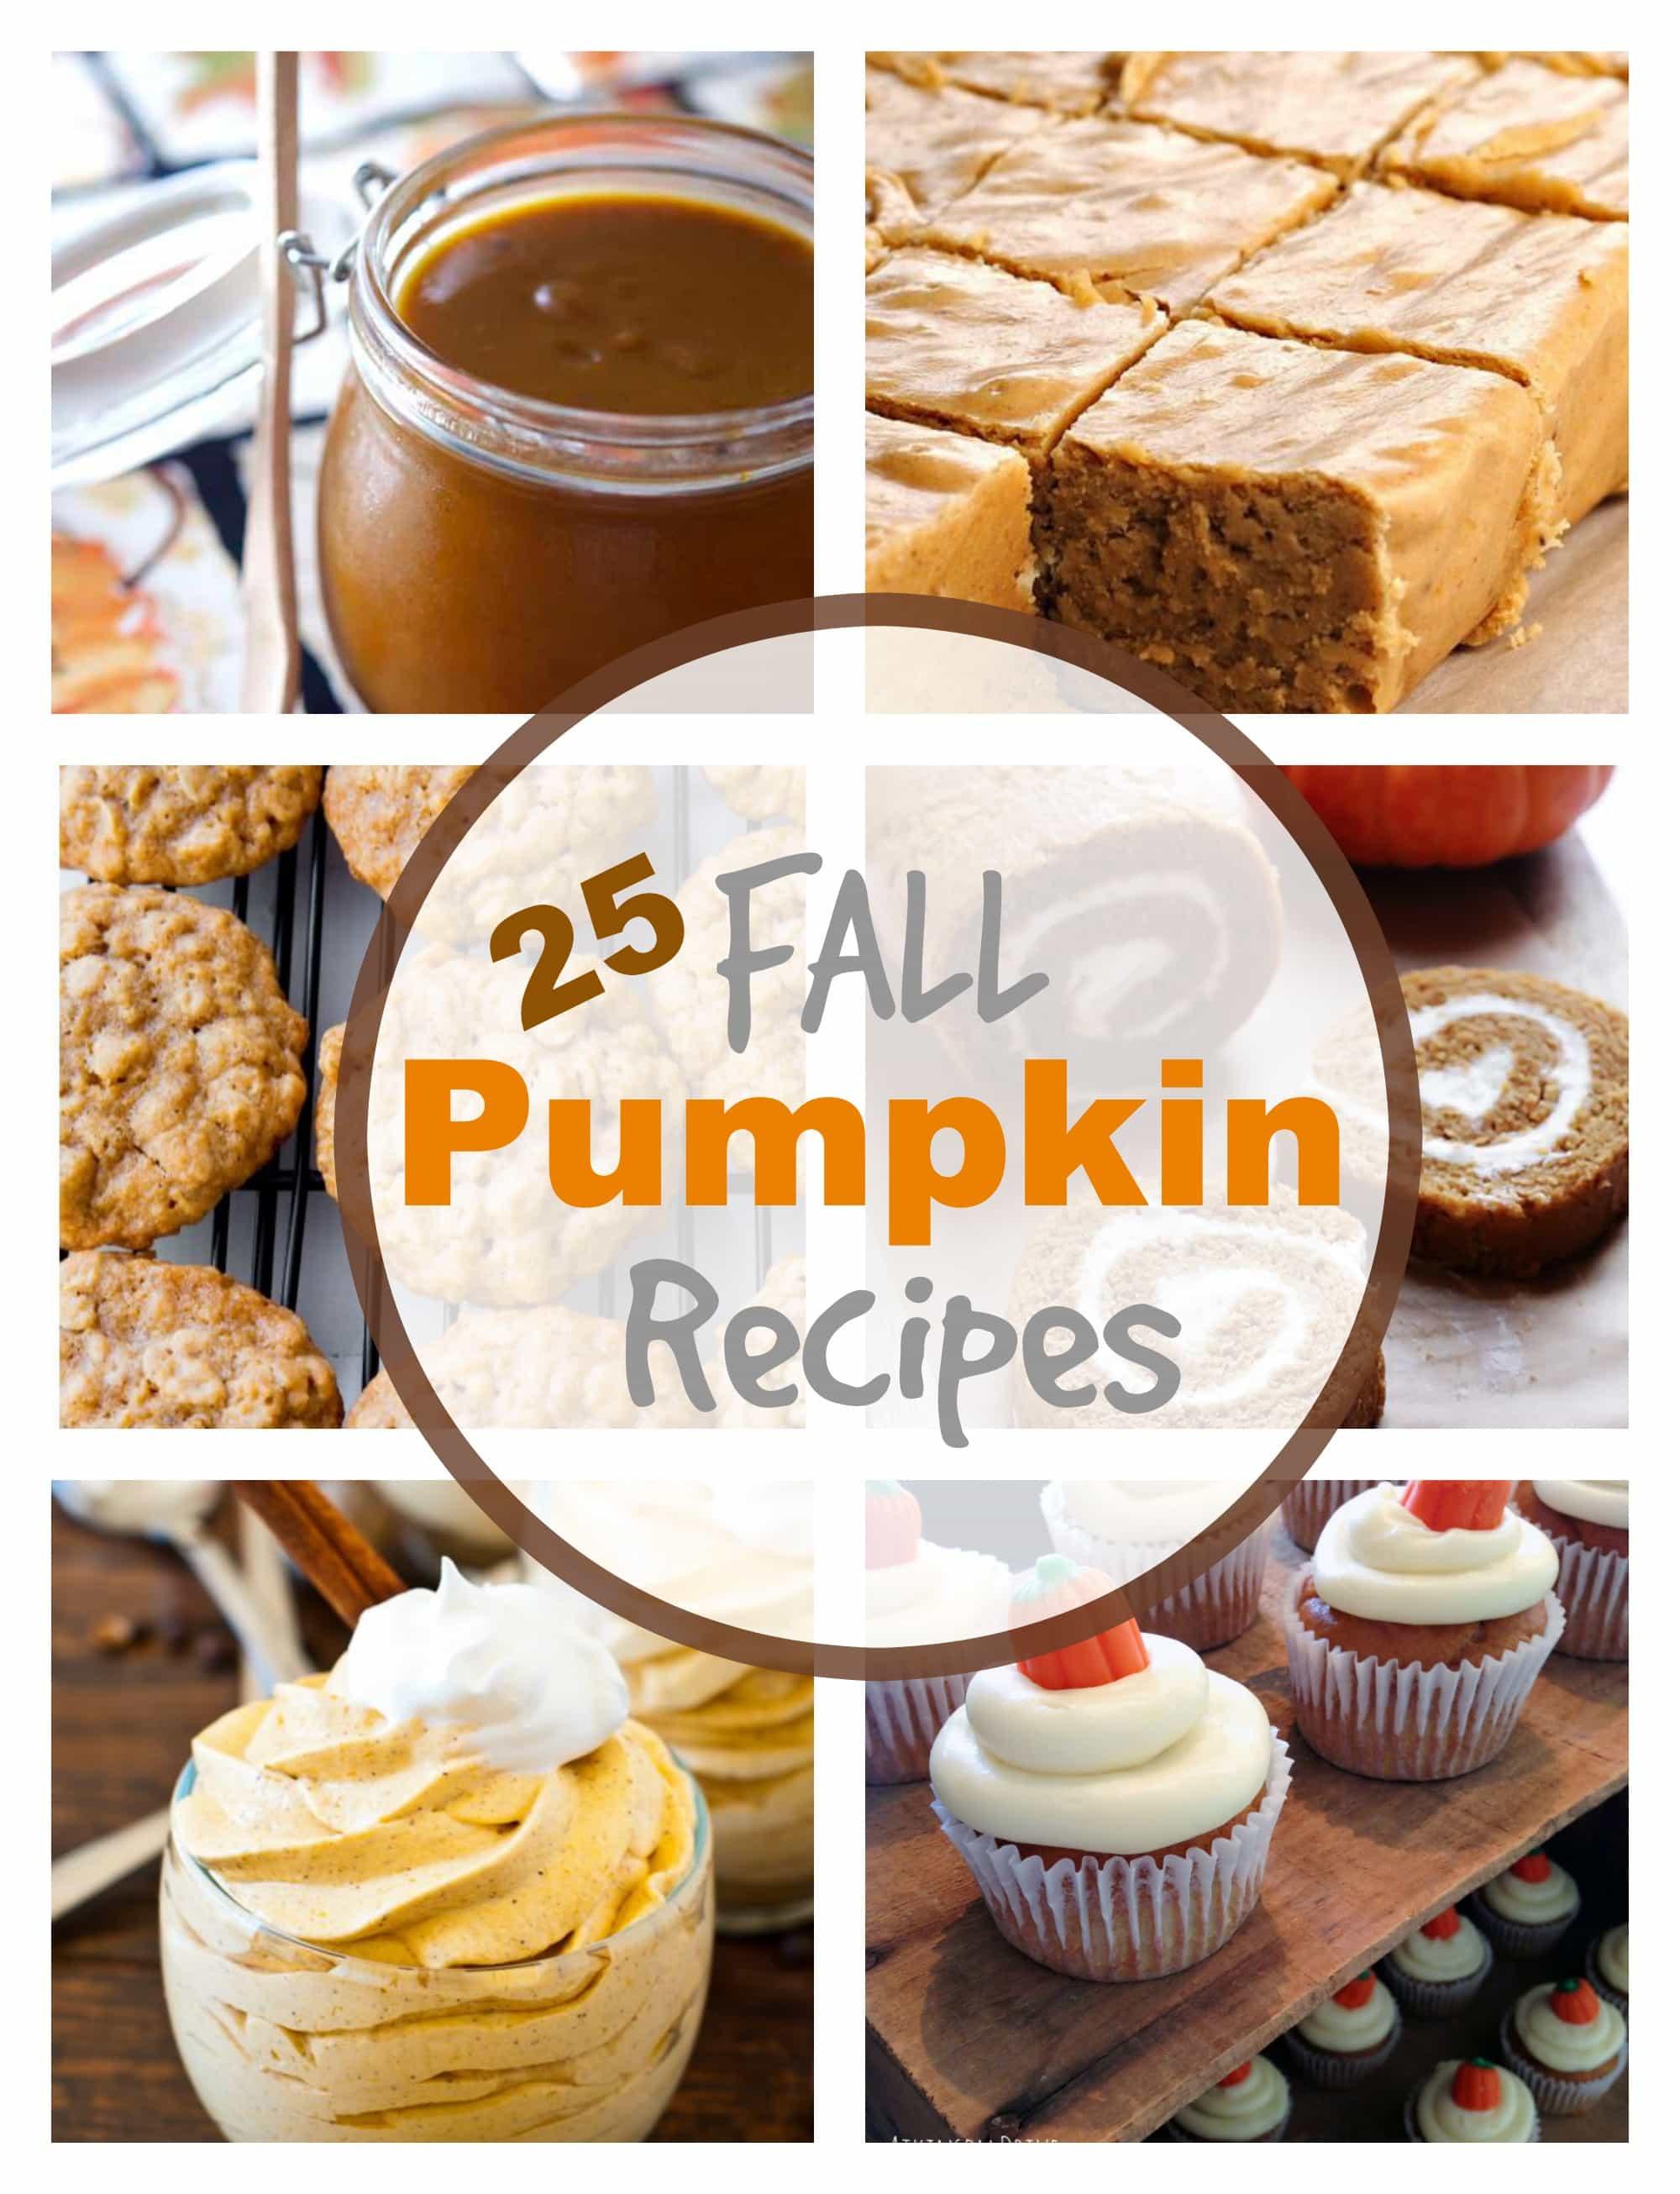 Fall Pumpkin Recipes  25 Fall Pumpkin Recipes PinkWhen